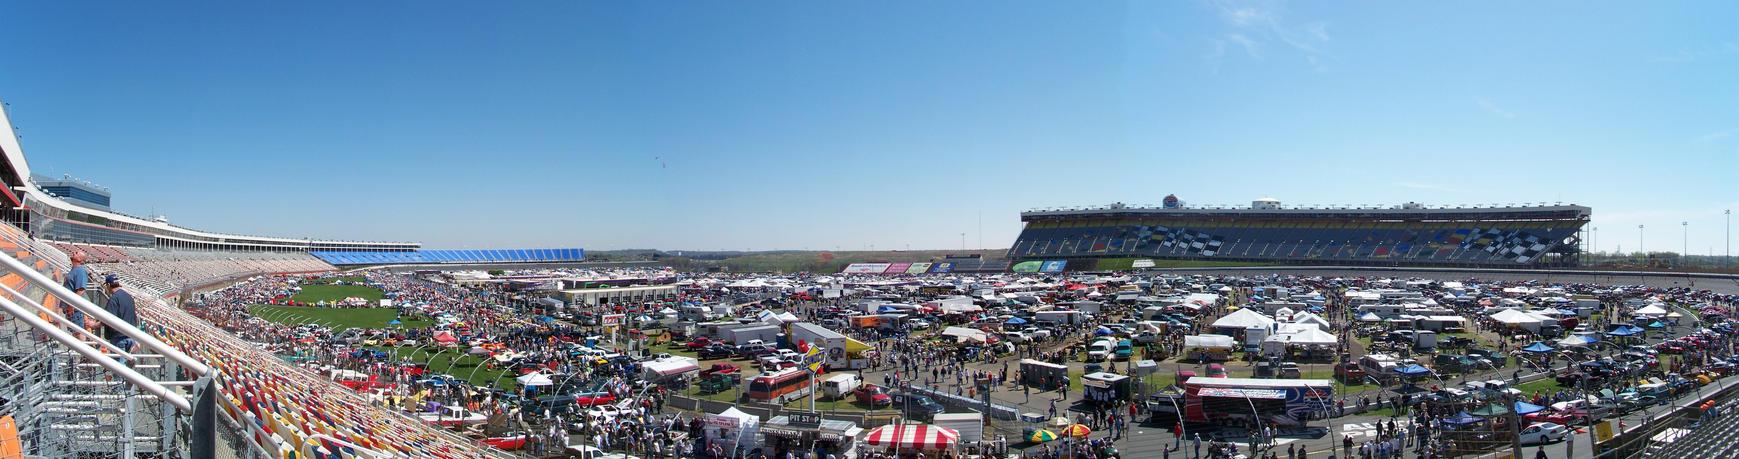 Lowes Speedway Panaramic By Detroitdemigod On Deviantart